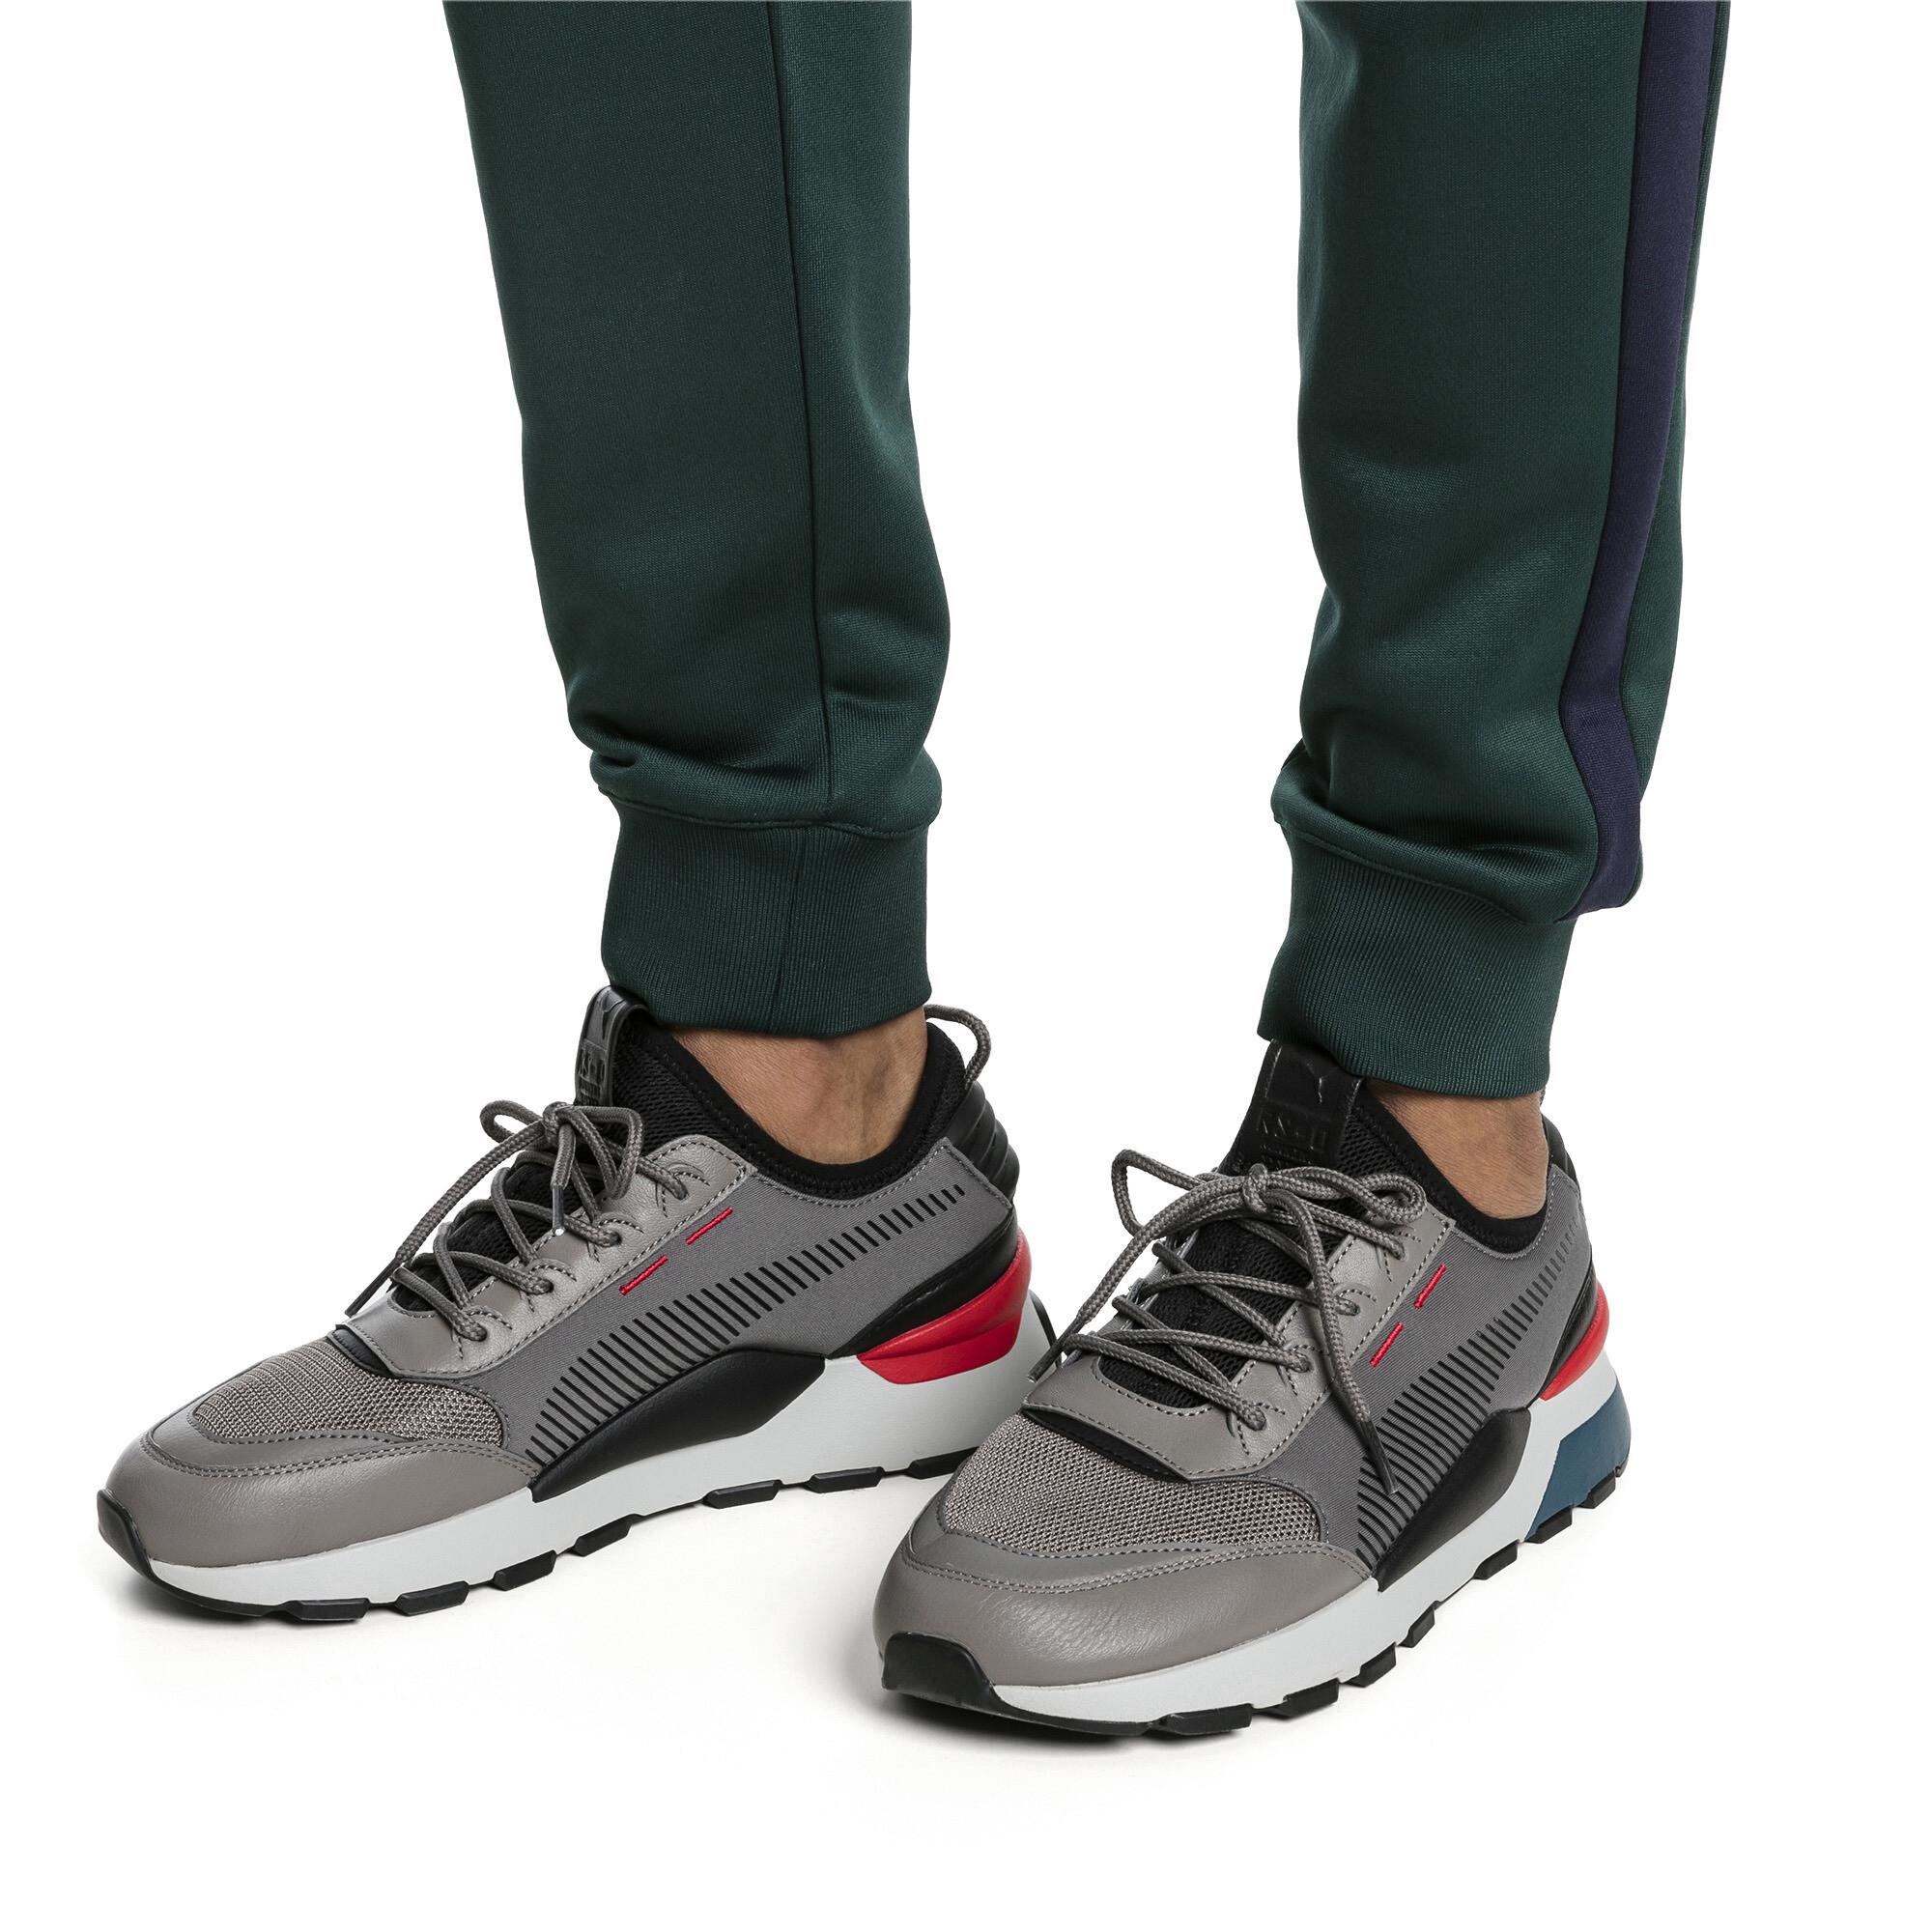 PUMA-RS-0-Tracks-Unisex-Shoe-Evolution thumbnail 18